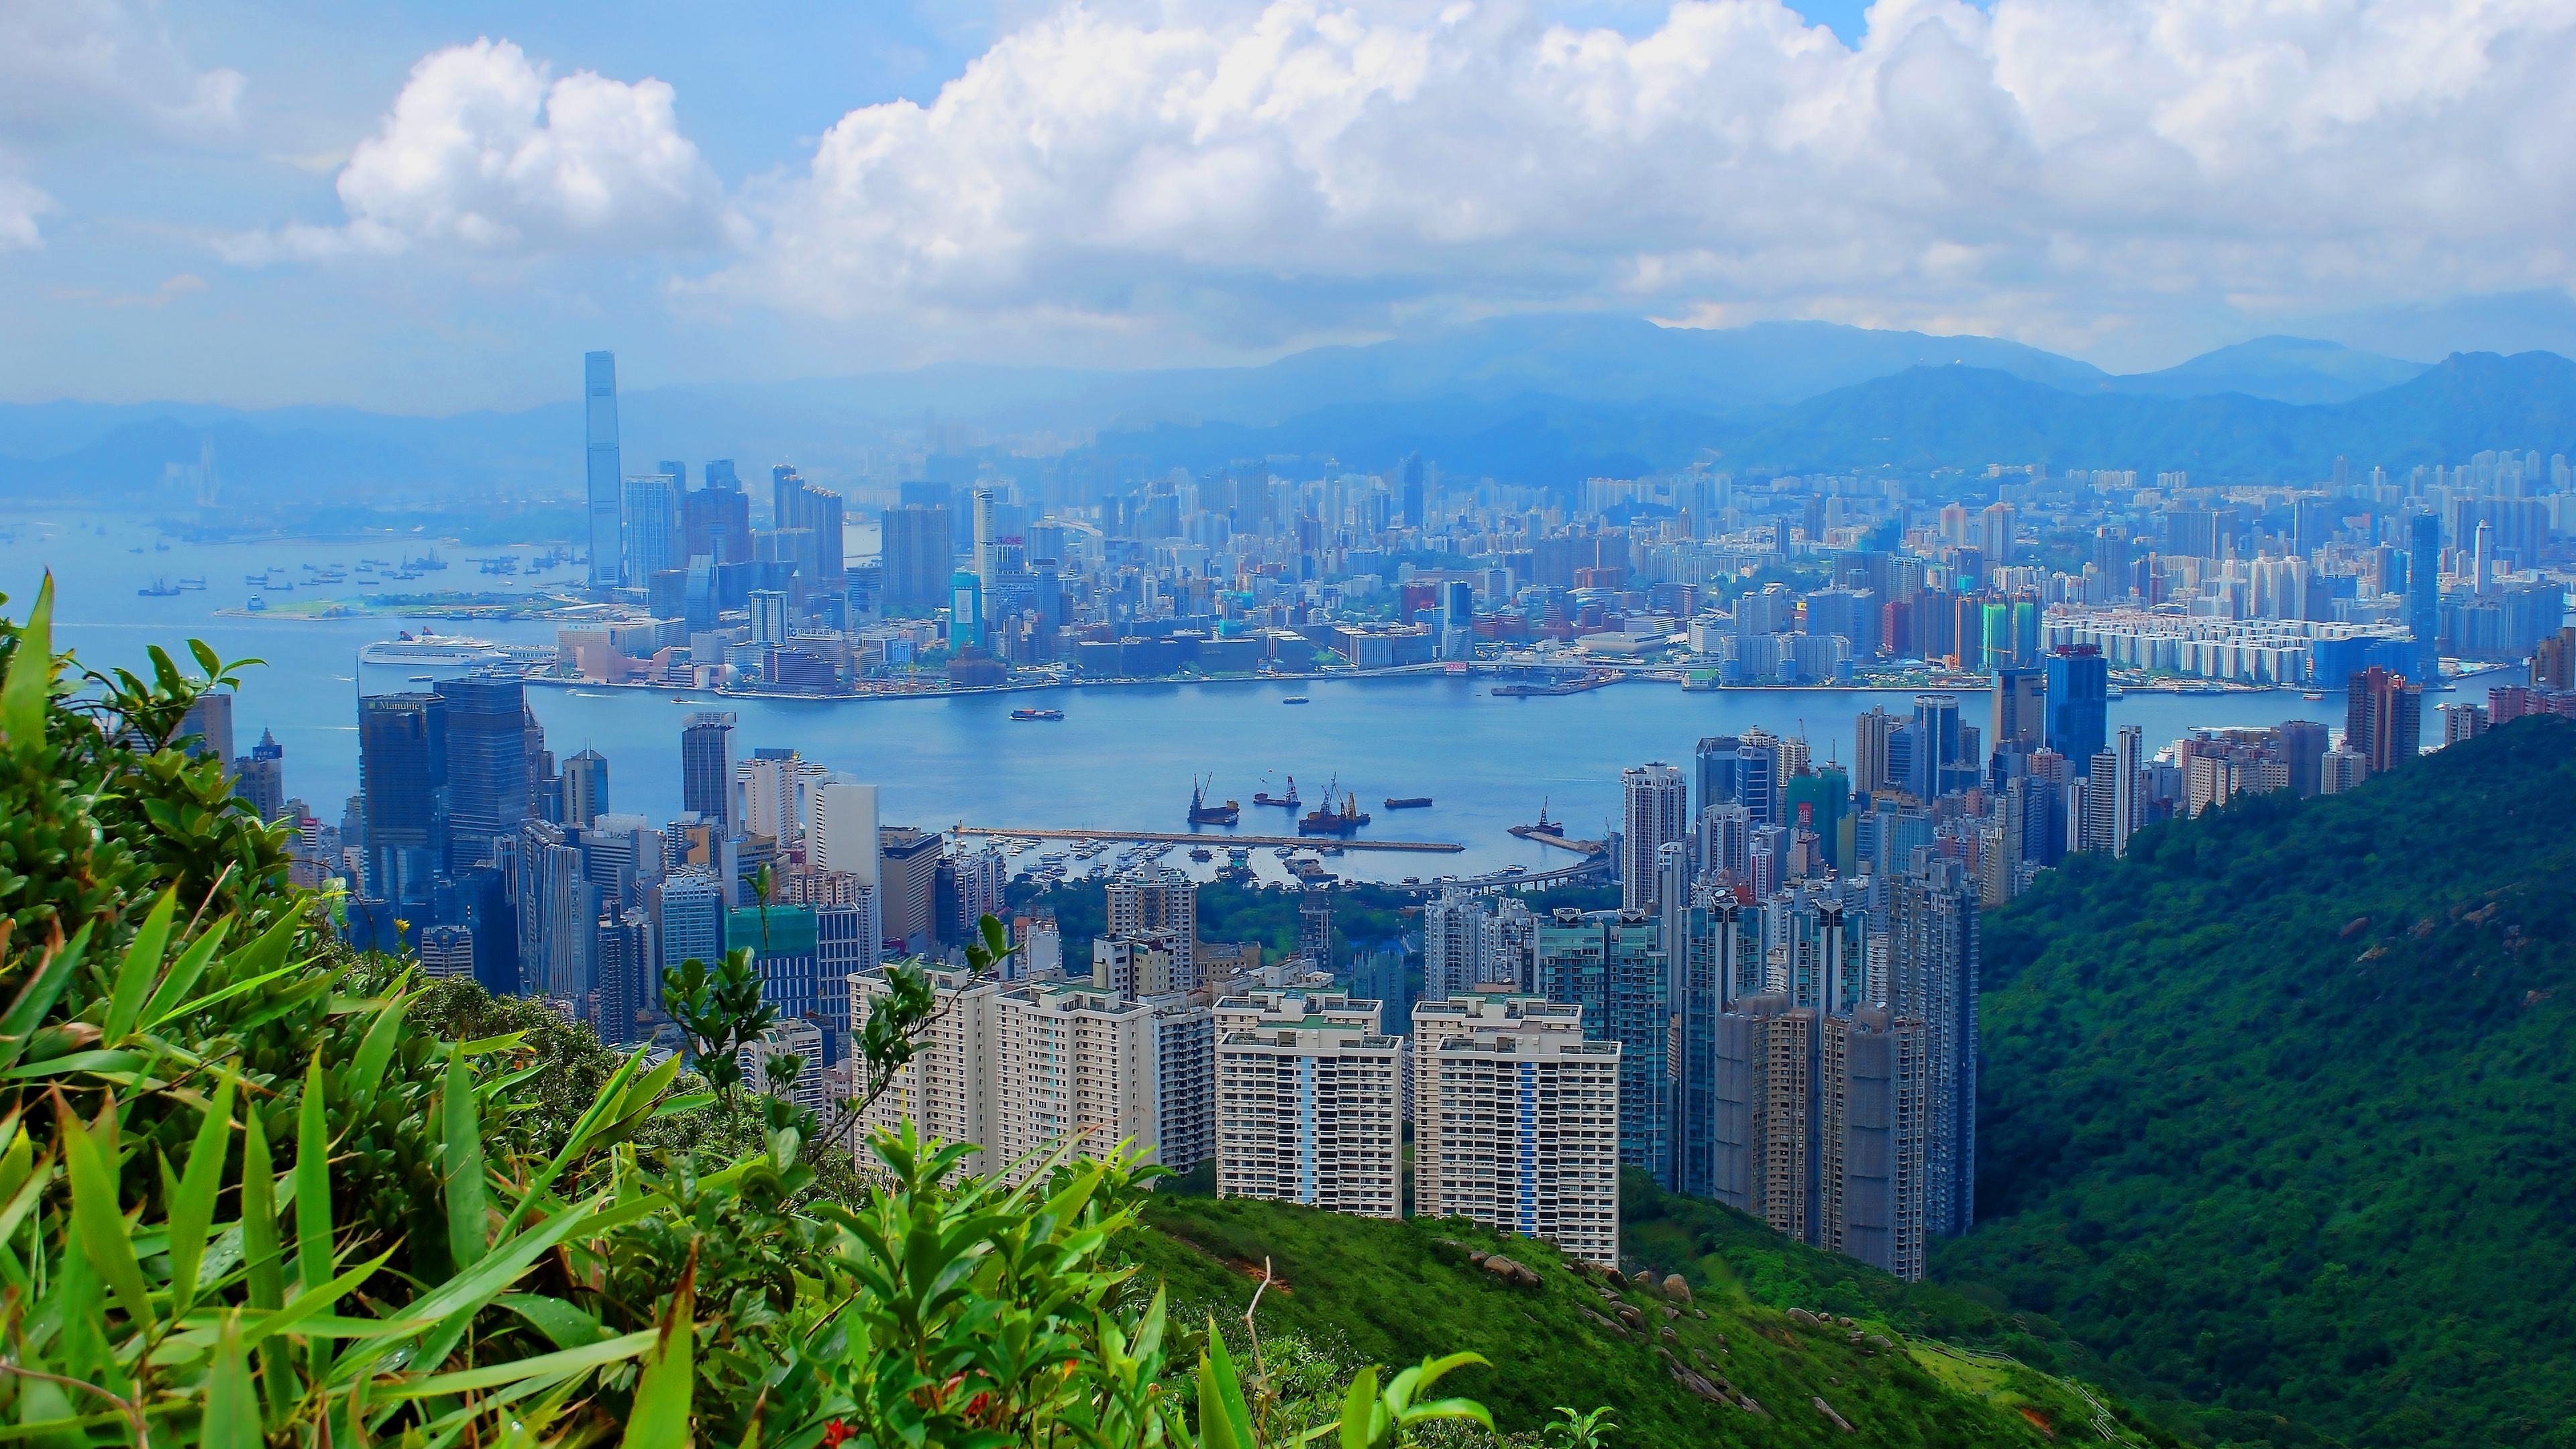 hong kong building top view sky 4k 1538066345 - hong kong, building, top view, sky 4k - top view, hong kong, Building